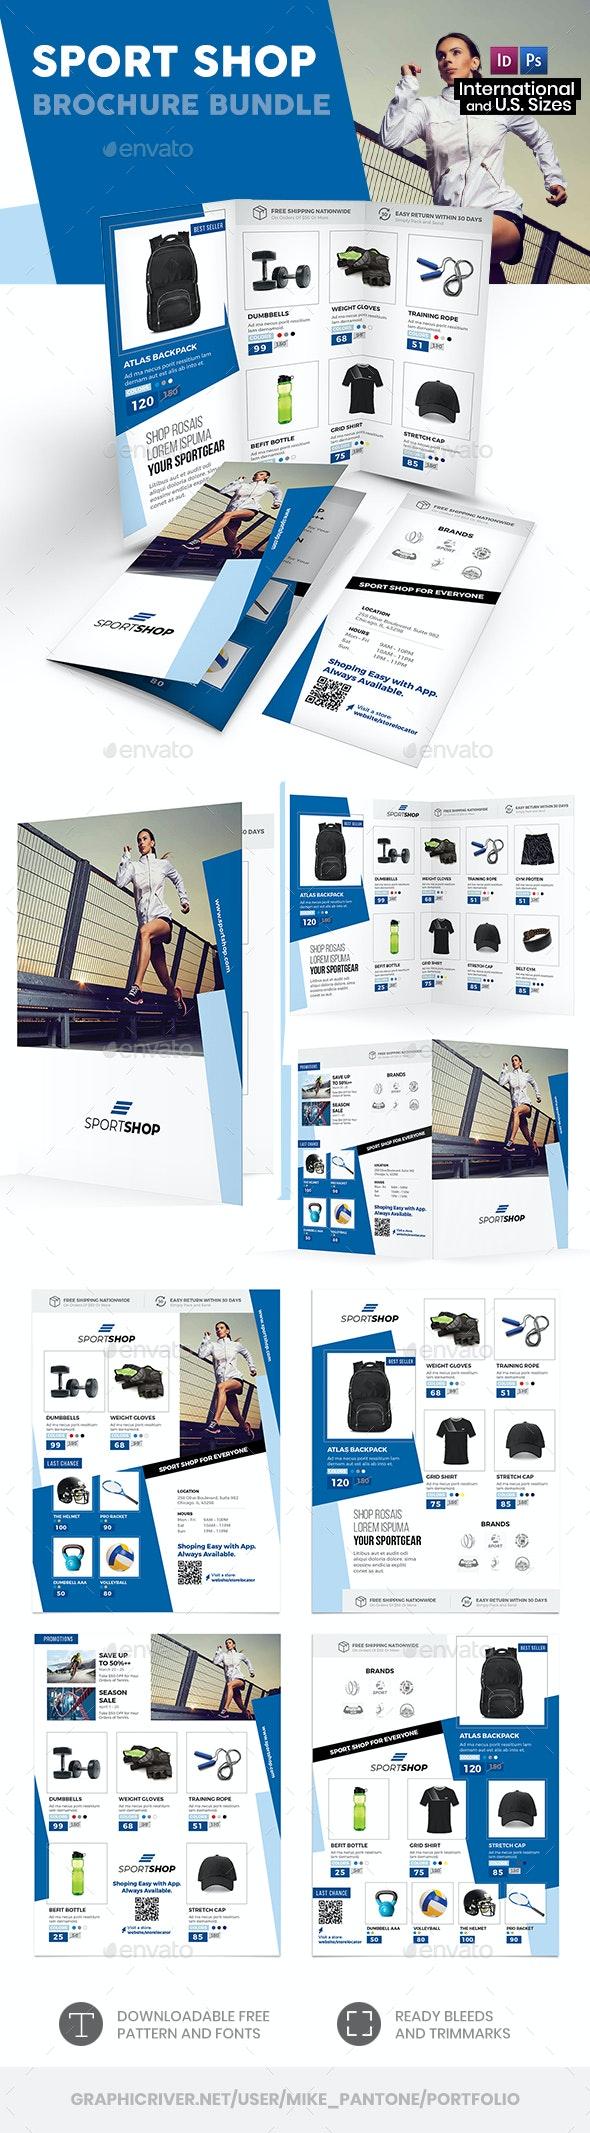 Sport Shop Print Bundle 2 - Informational Brochures